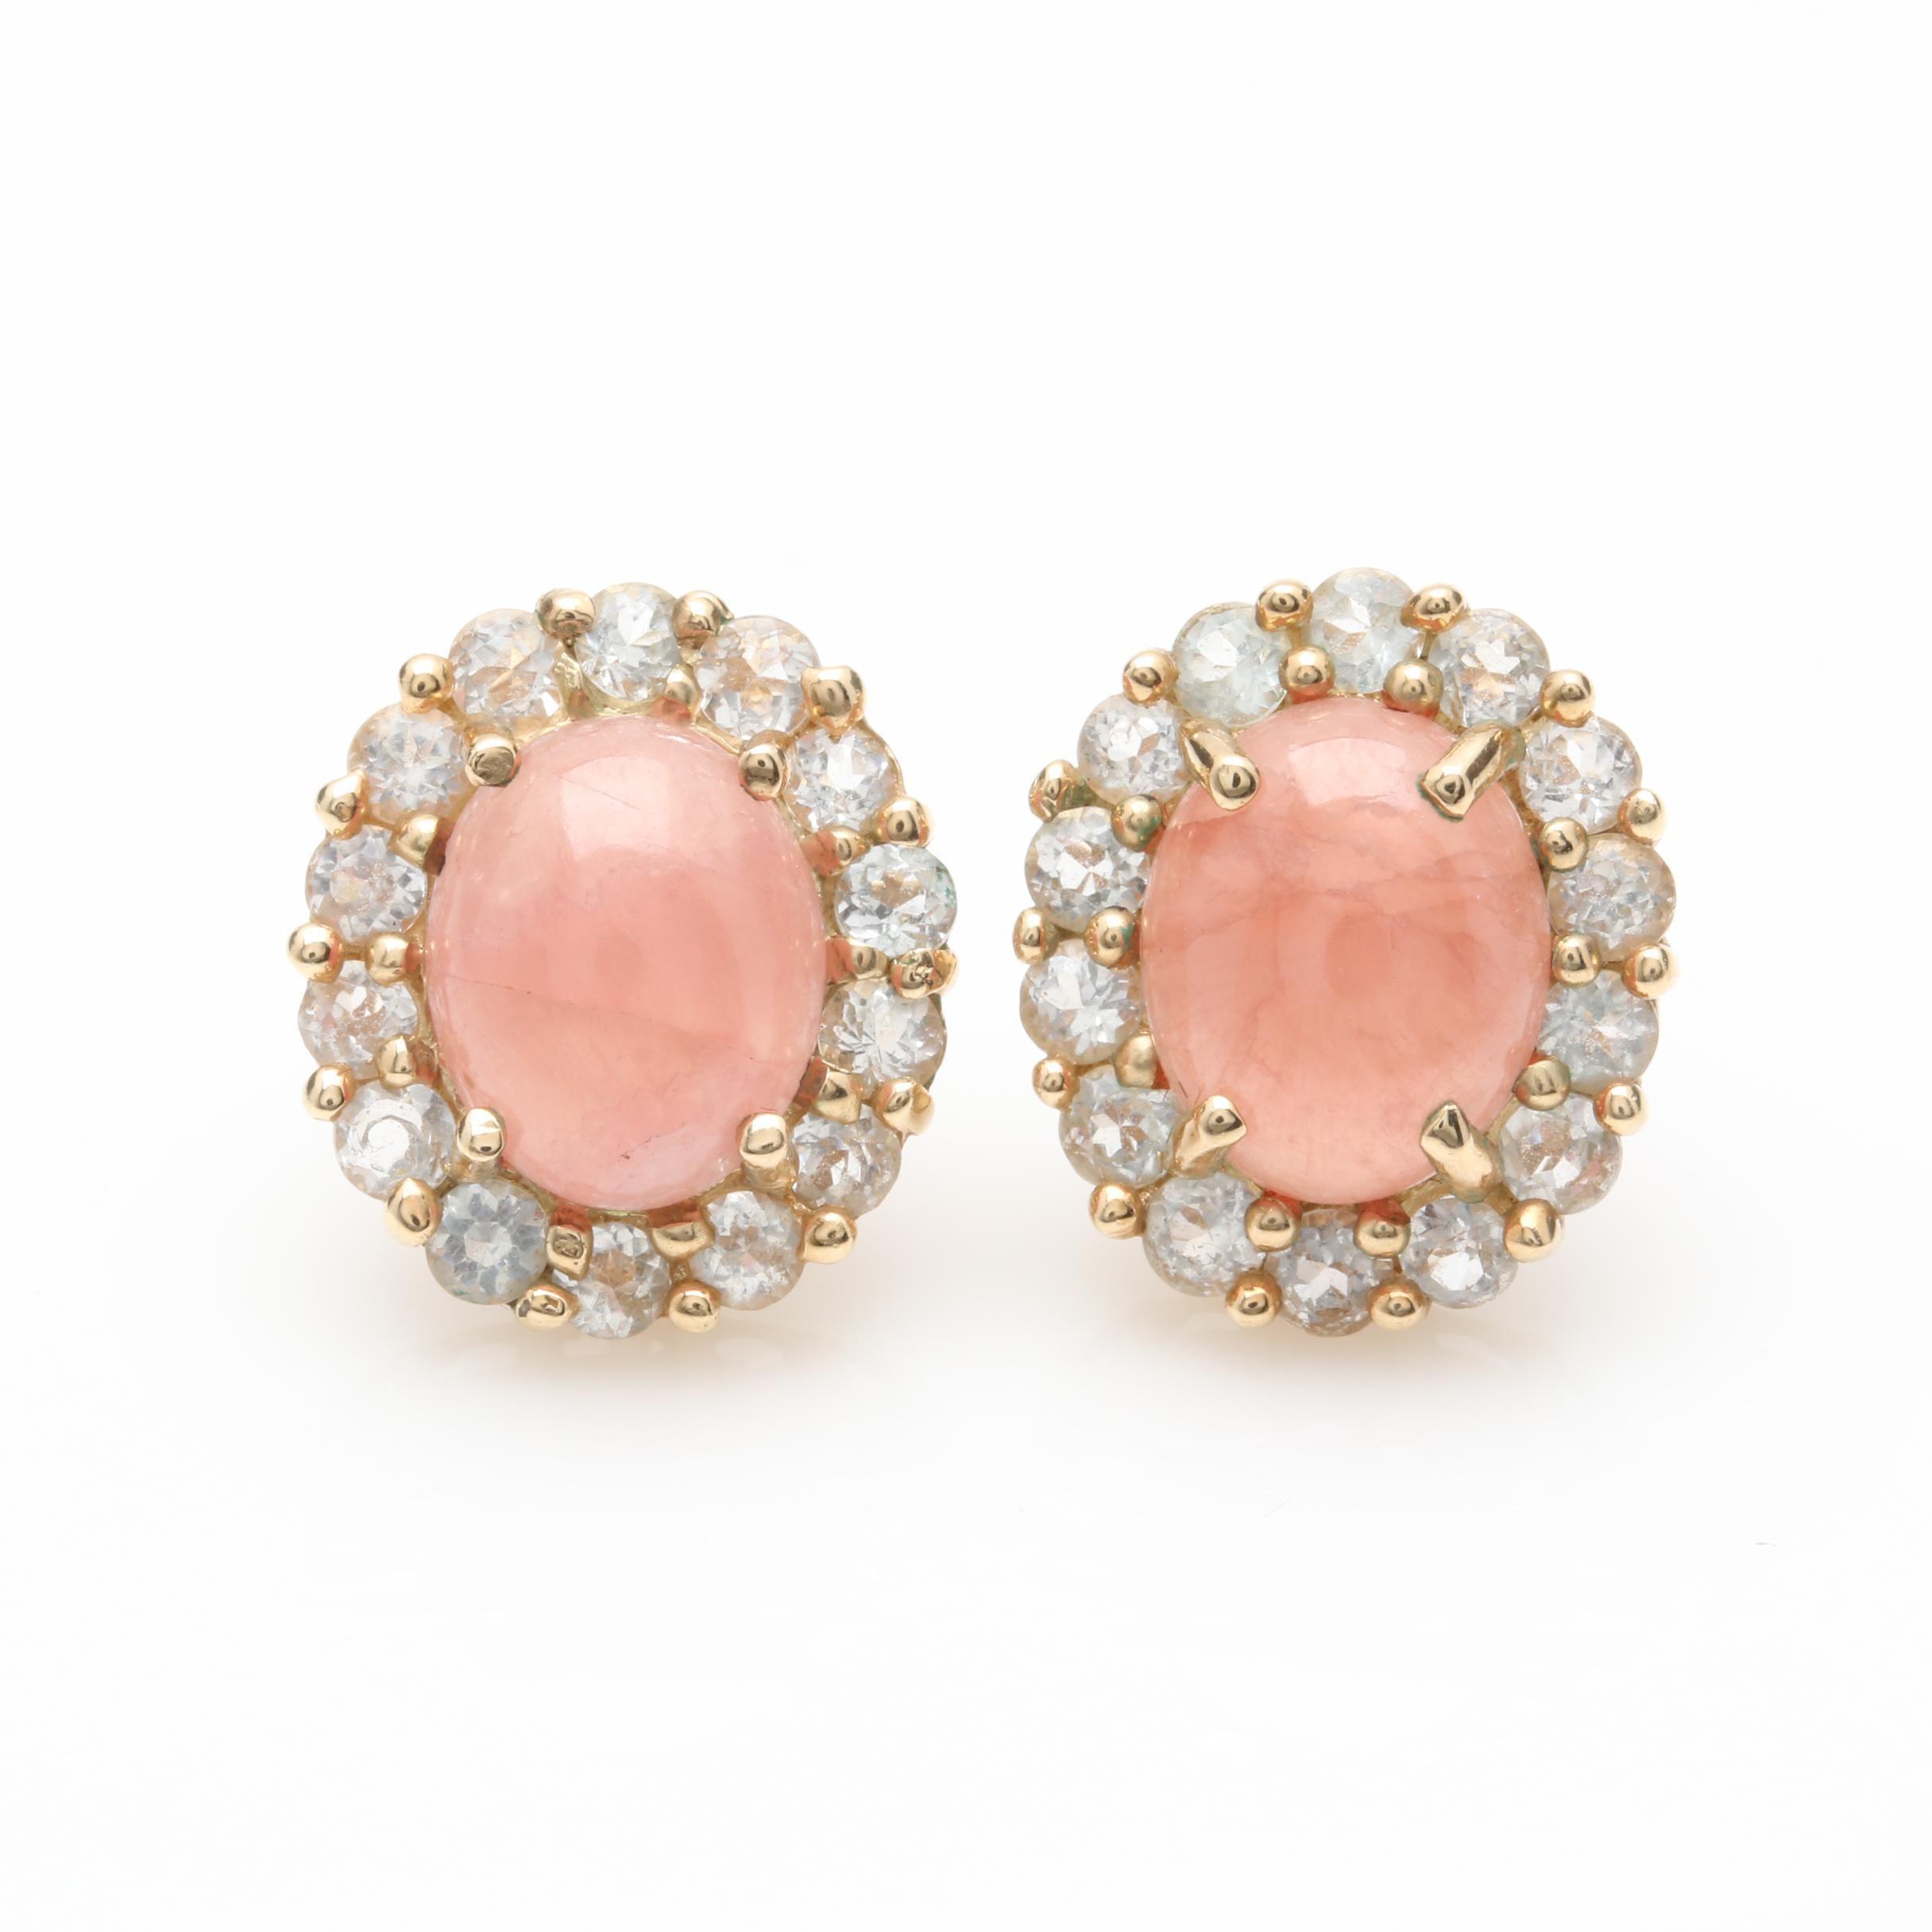 10K Yellow Gold Single Crystal Rhodochrosite and White Topaz Earrings